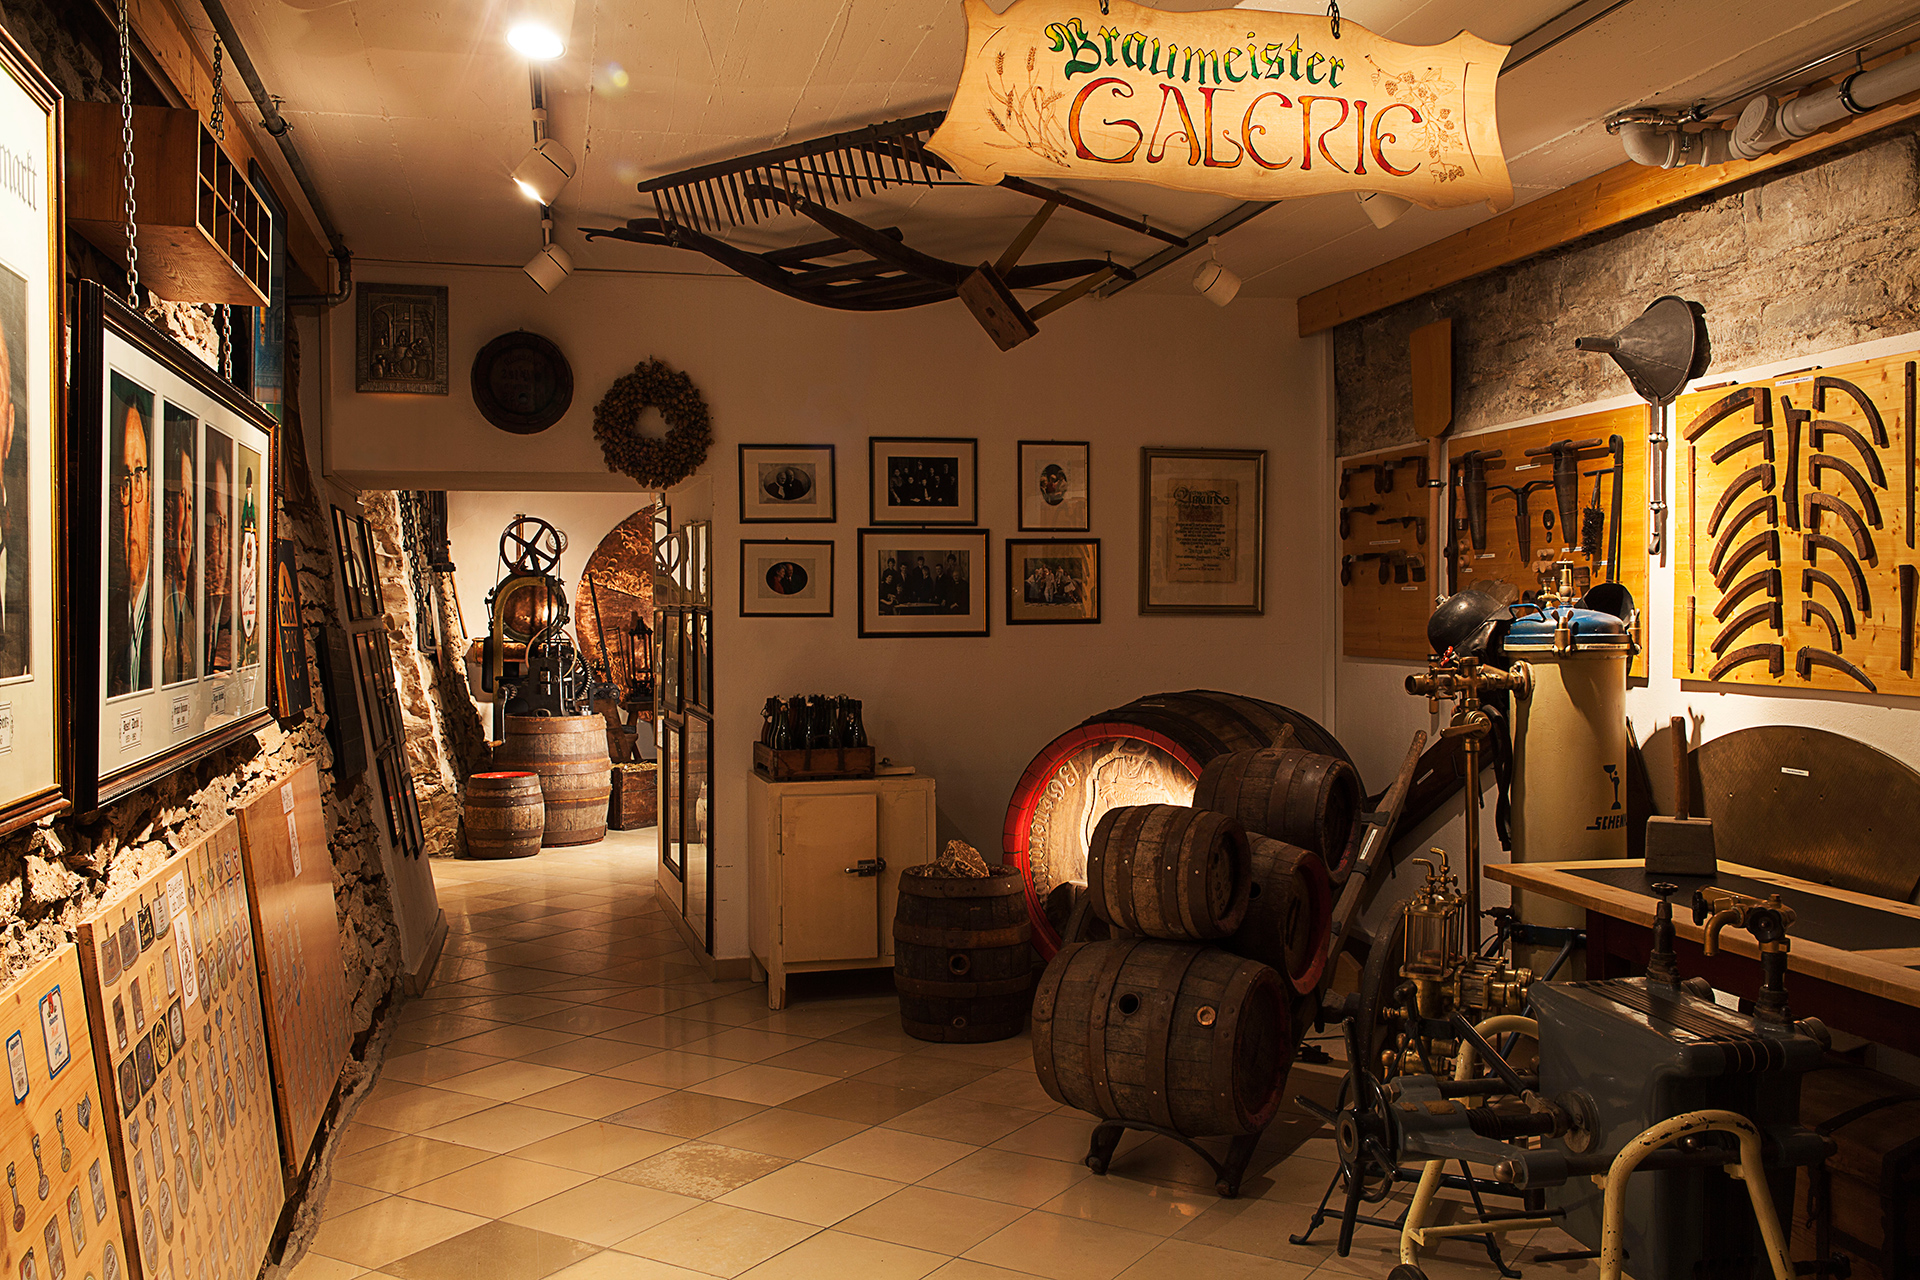 Raum im Brauereimuseum